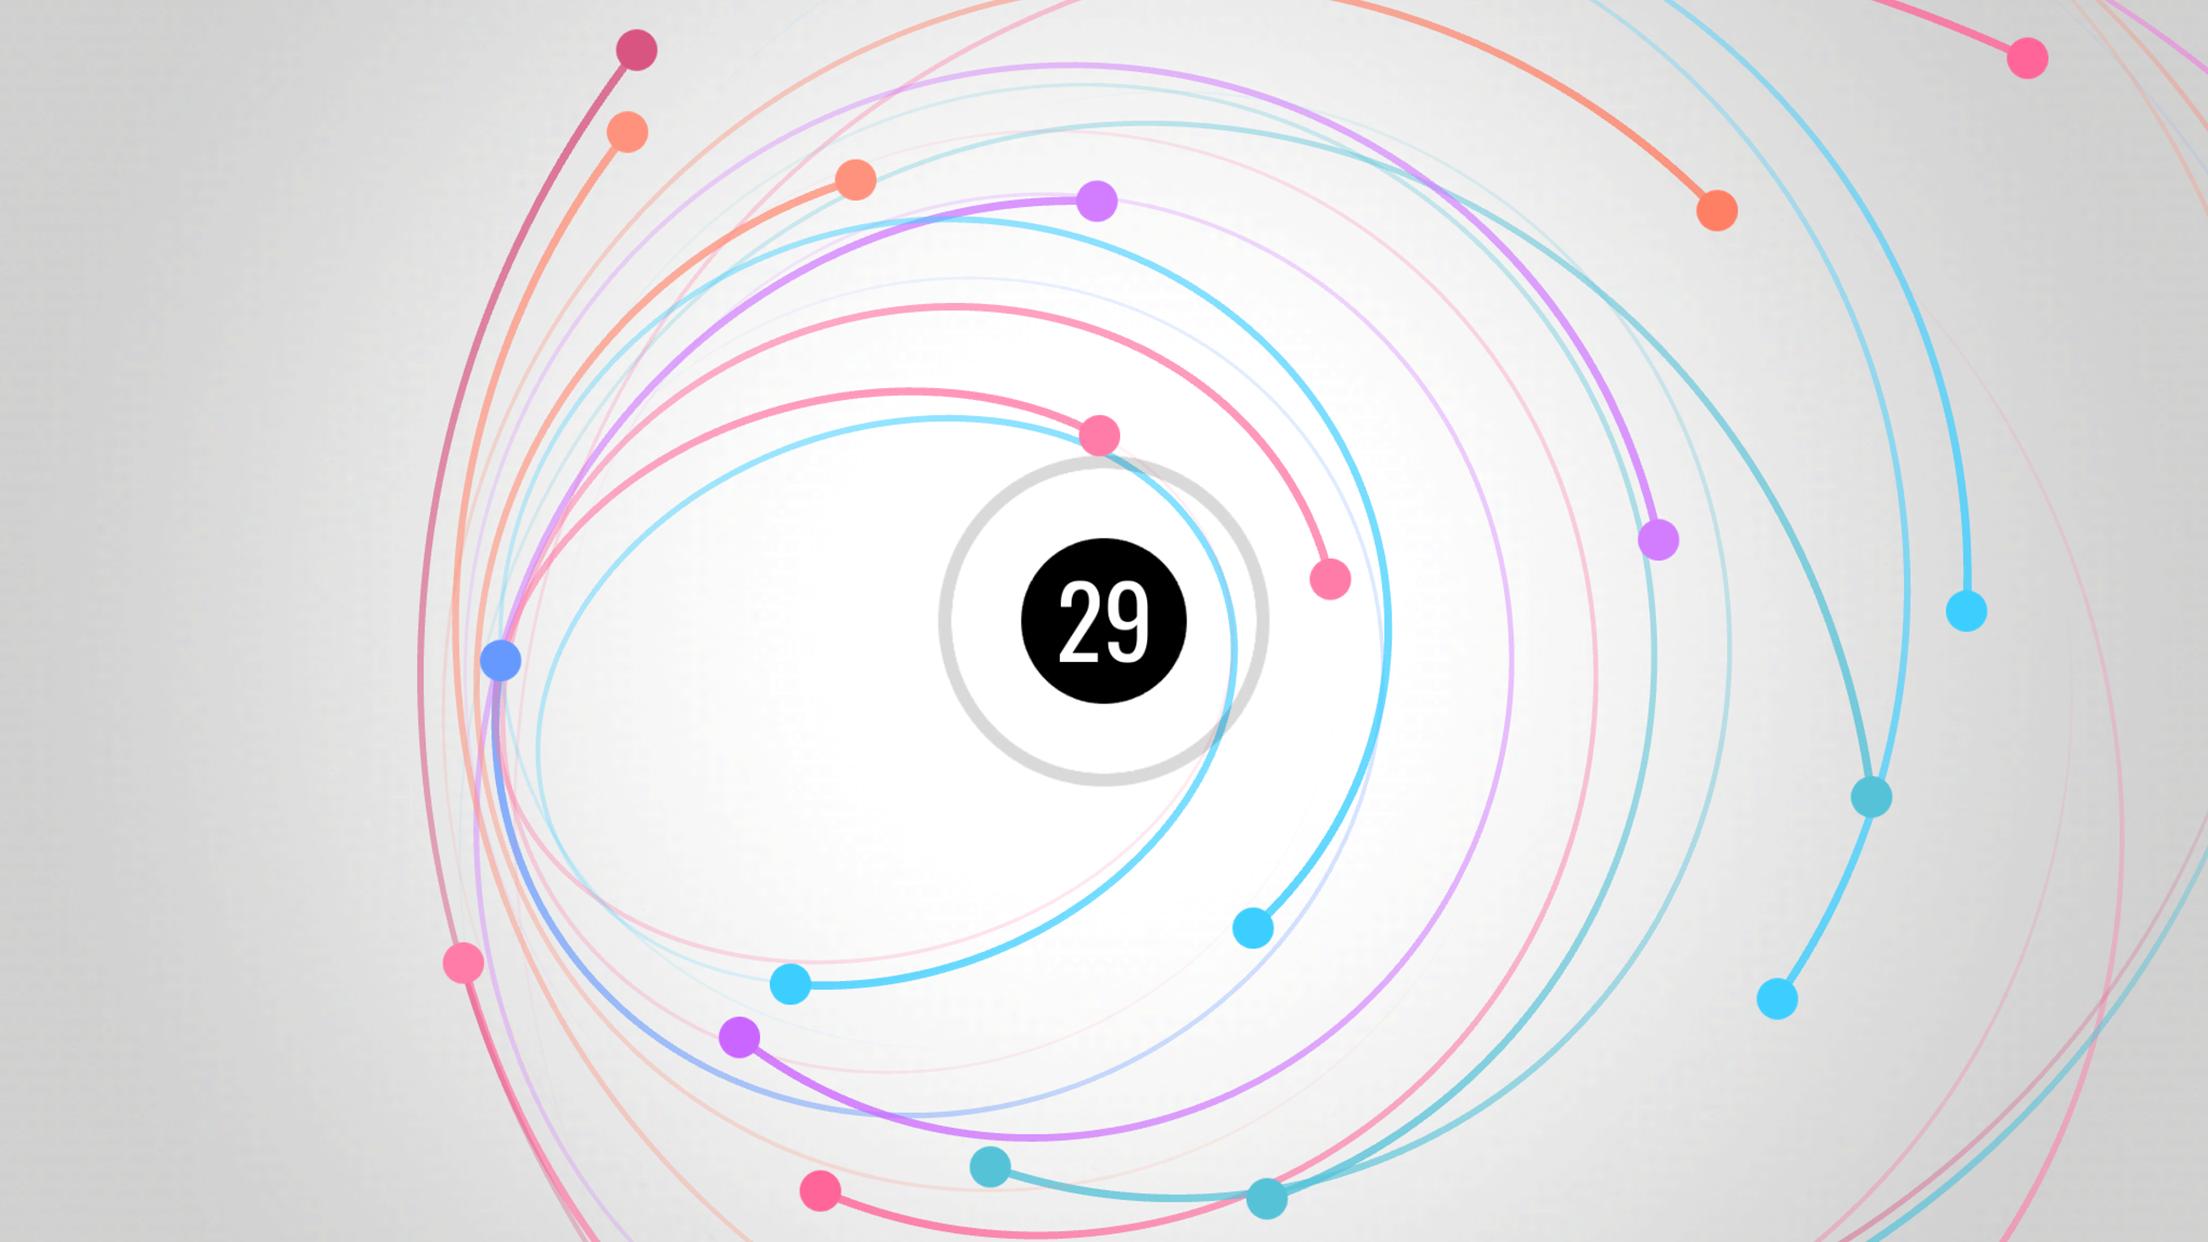 Orbit - Playing with Gravity Screenshot